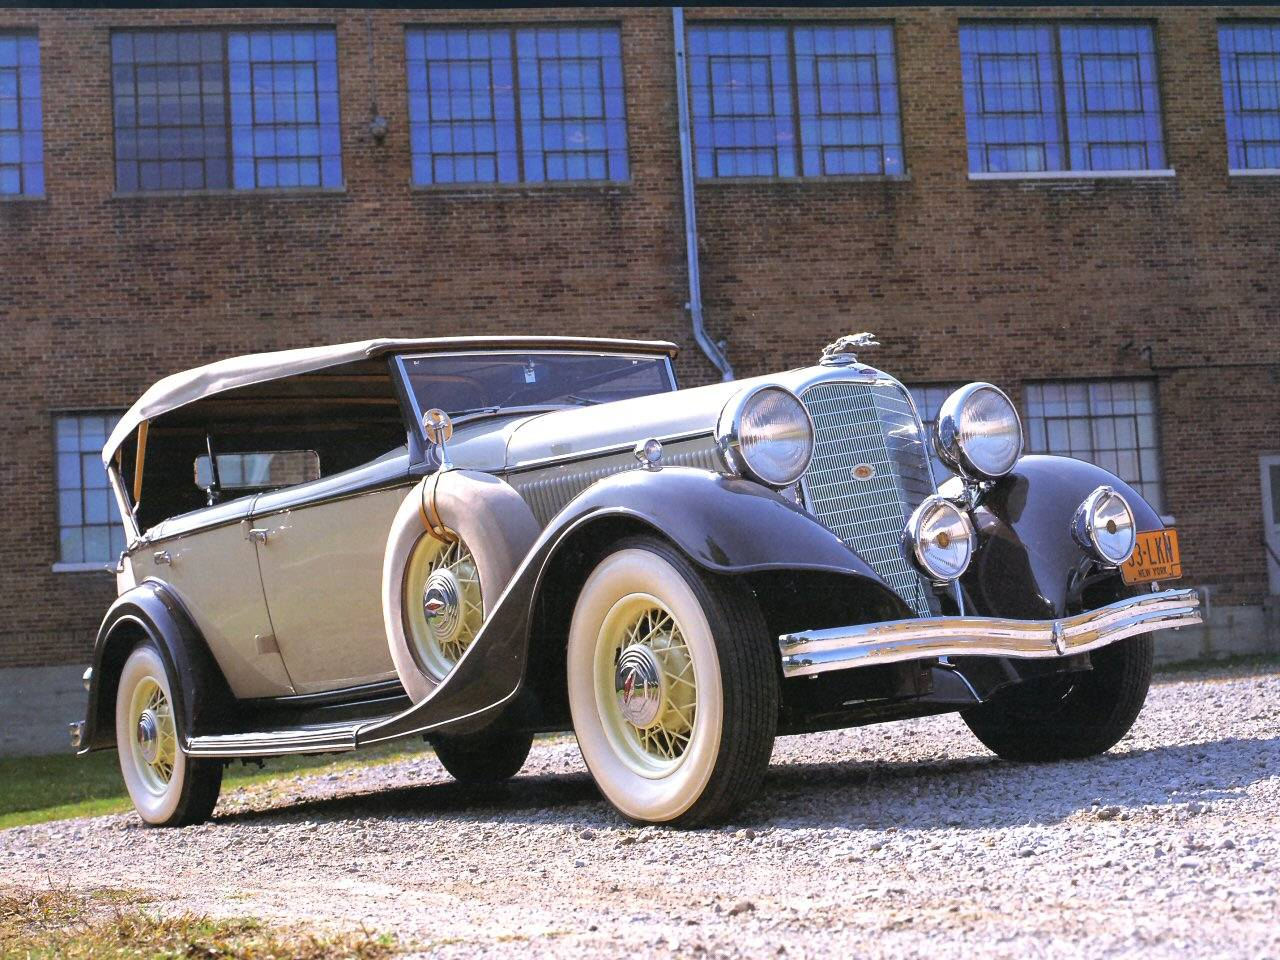 High Resolution Wallpaper | 1933 Lincoln Model Ka 1280x960 px